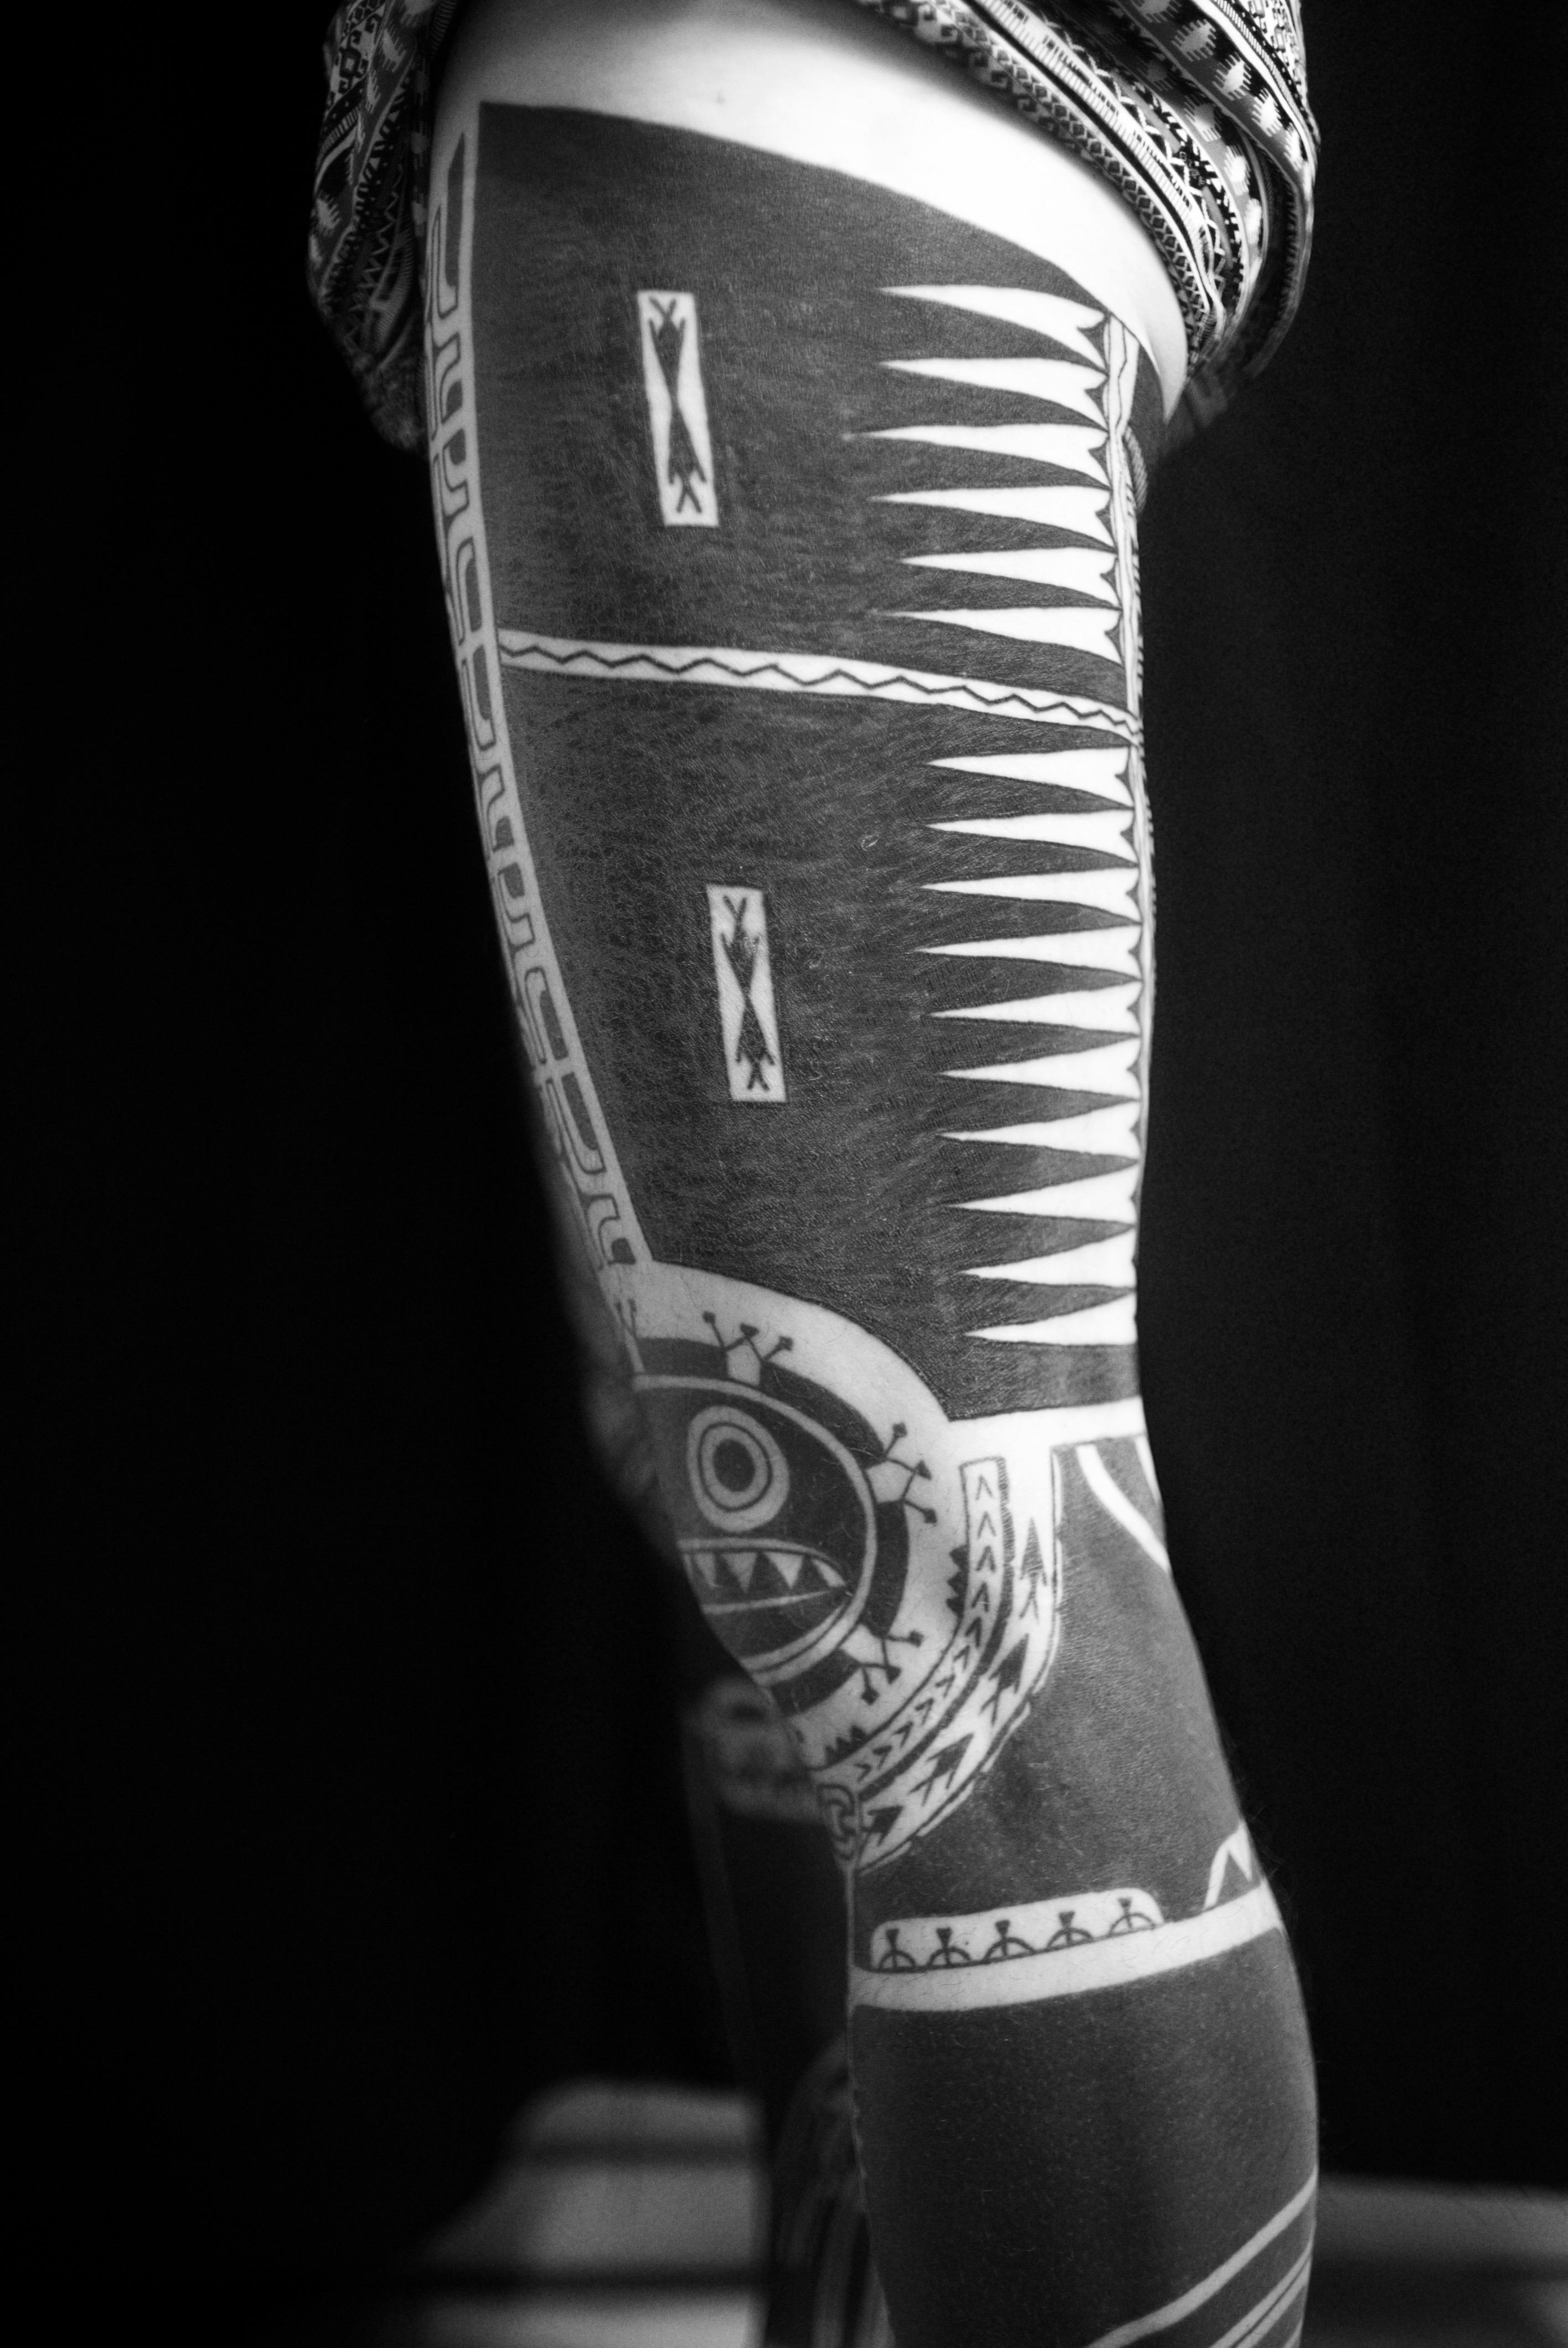 Marquesan leg sleeve